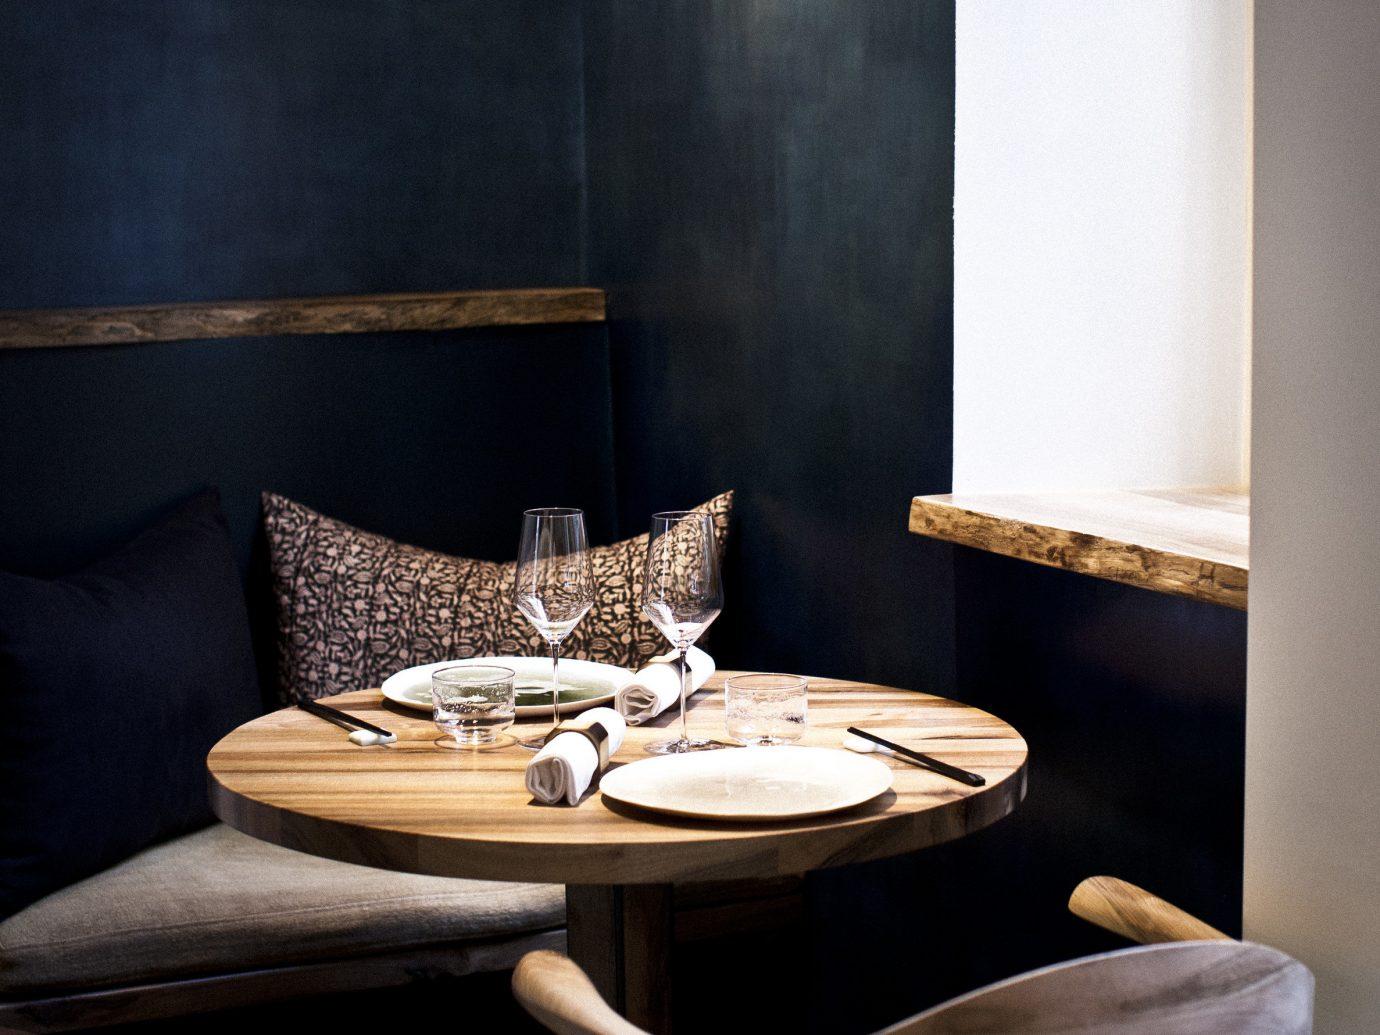 Food + Drink wall room indoor living room table furniture floor interior design lighting wood home dining room Design window covering set dining table